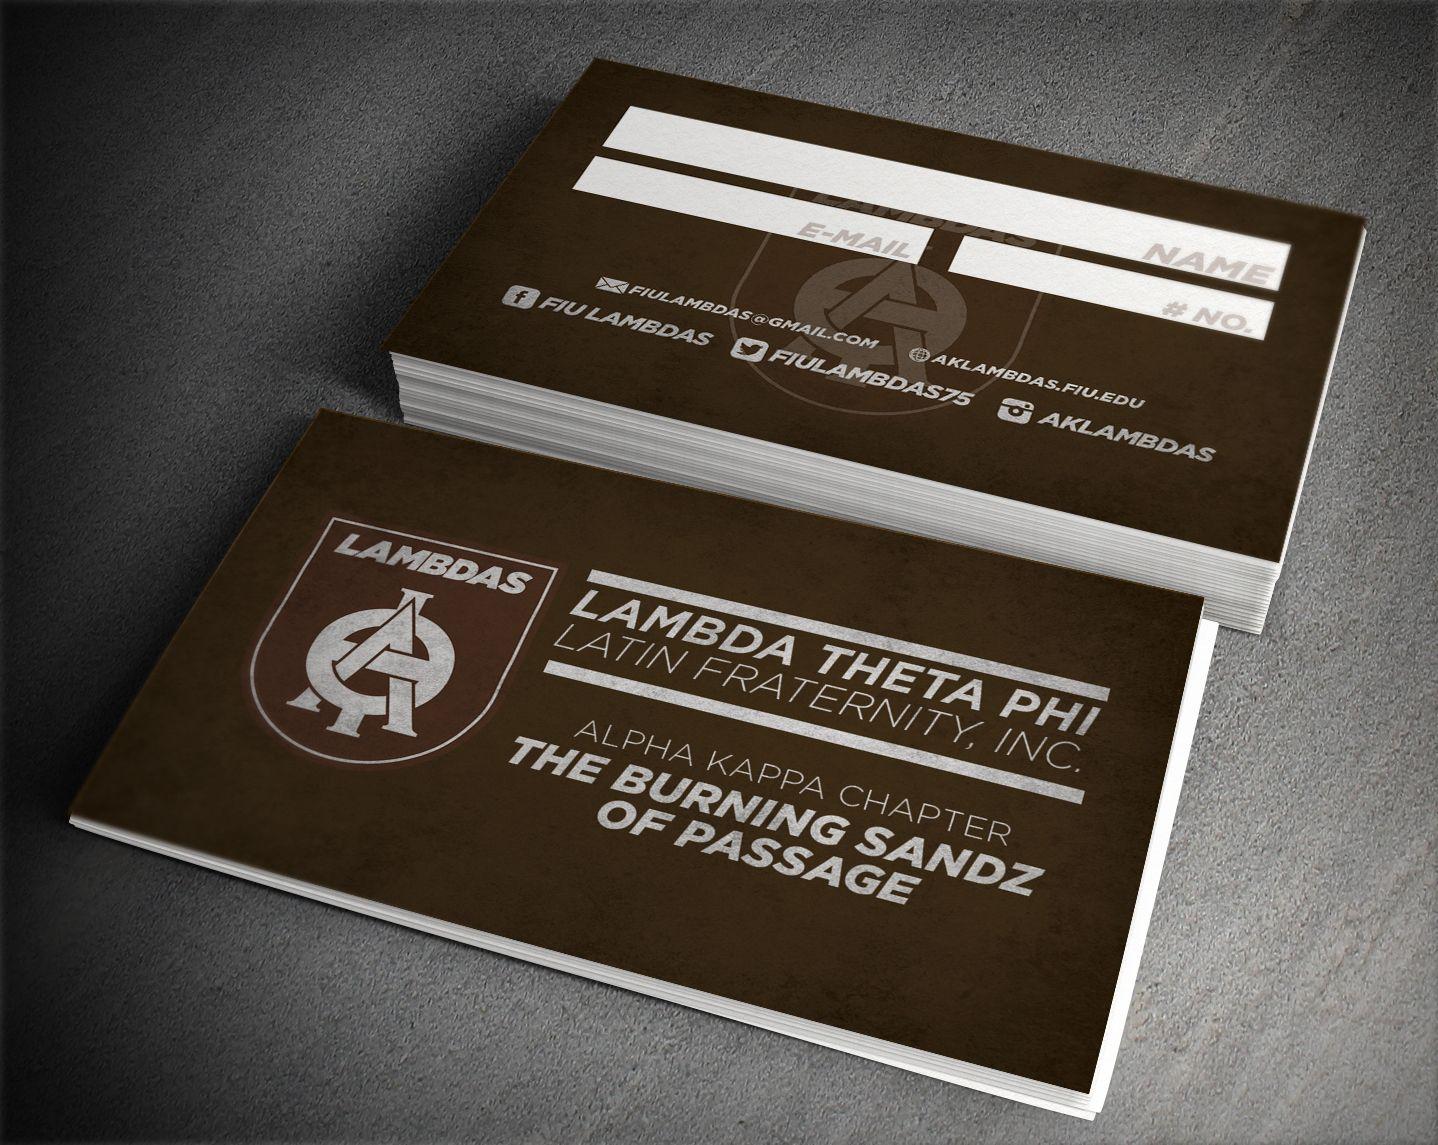 Lambda theta phi recruitment business cards greeks nphc lambda theta phi recruitment business cards colourmoves